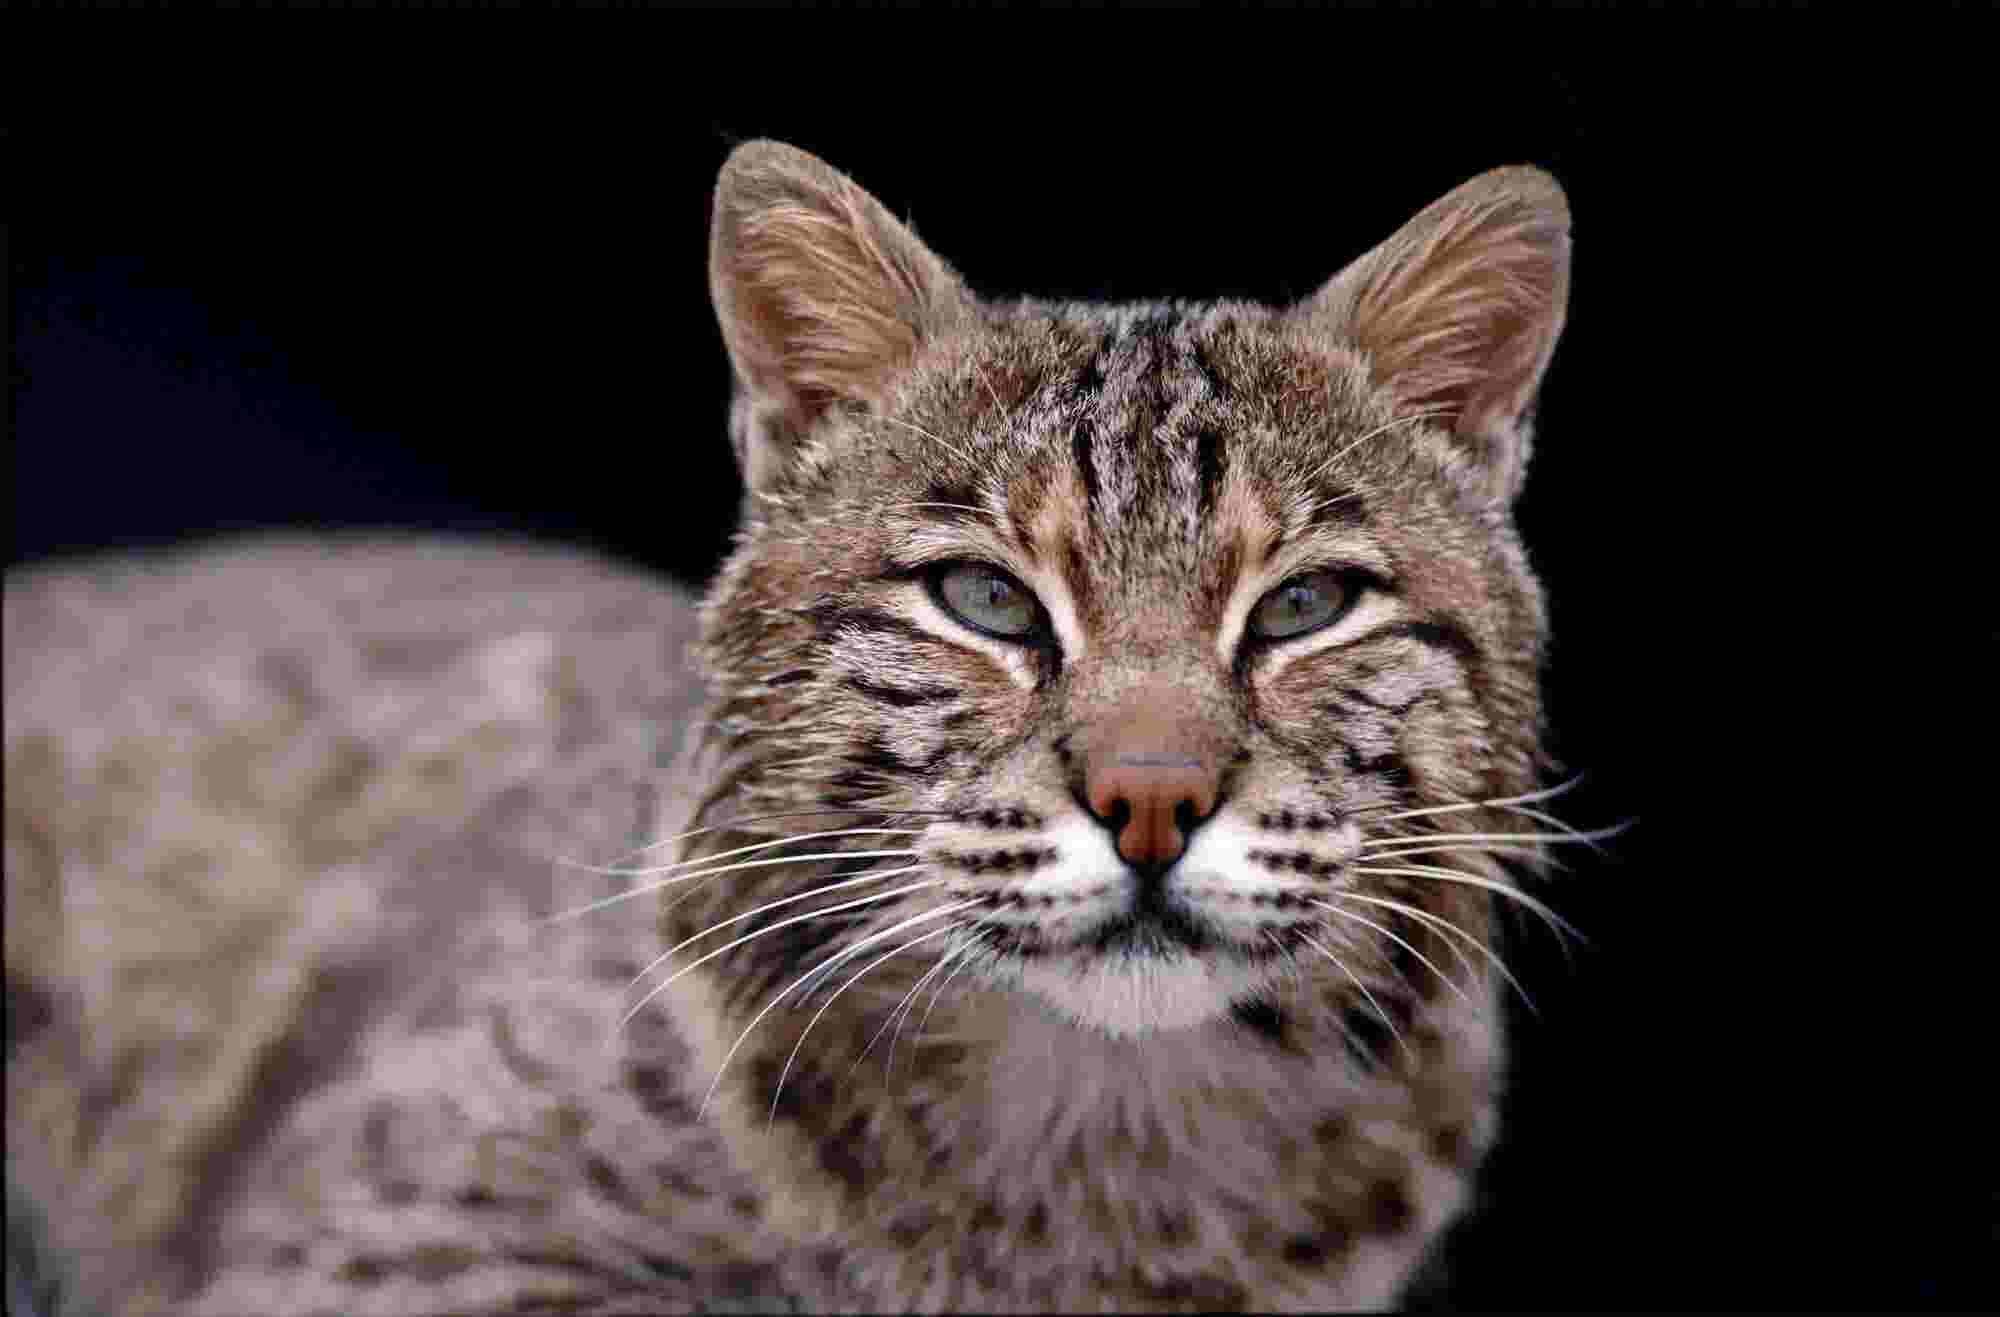 Indiana lawmaker wants bobcat hunting